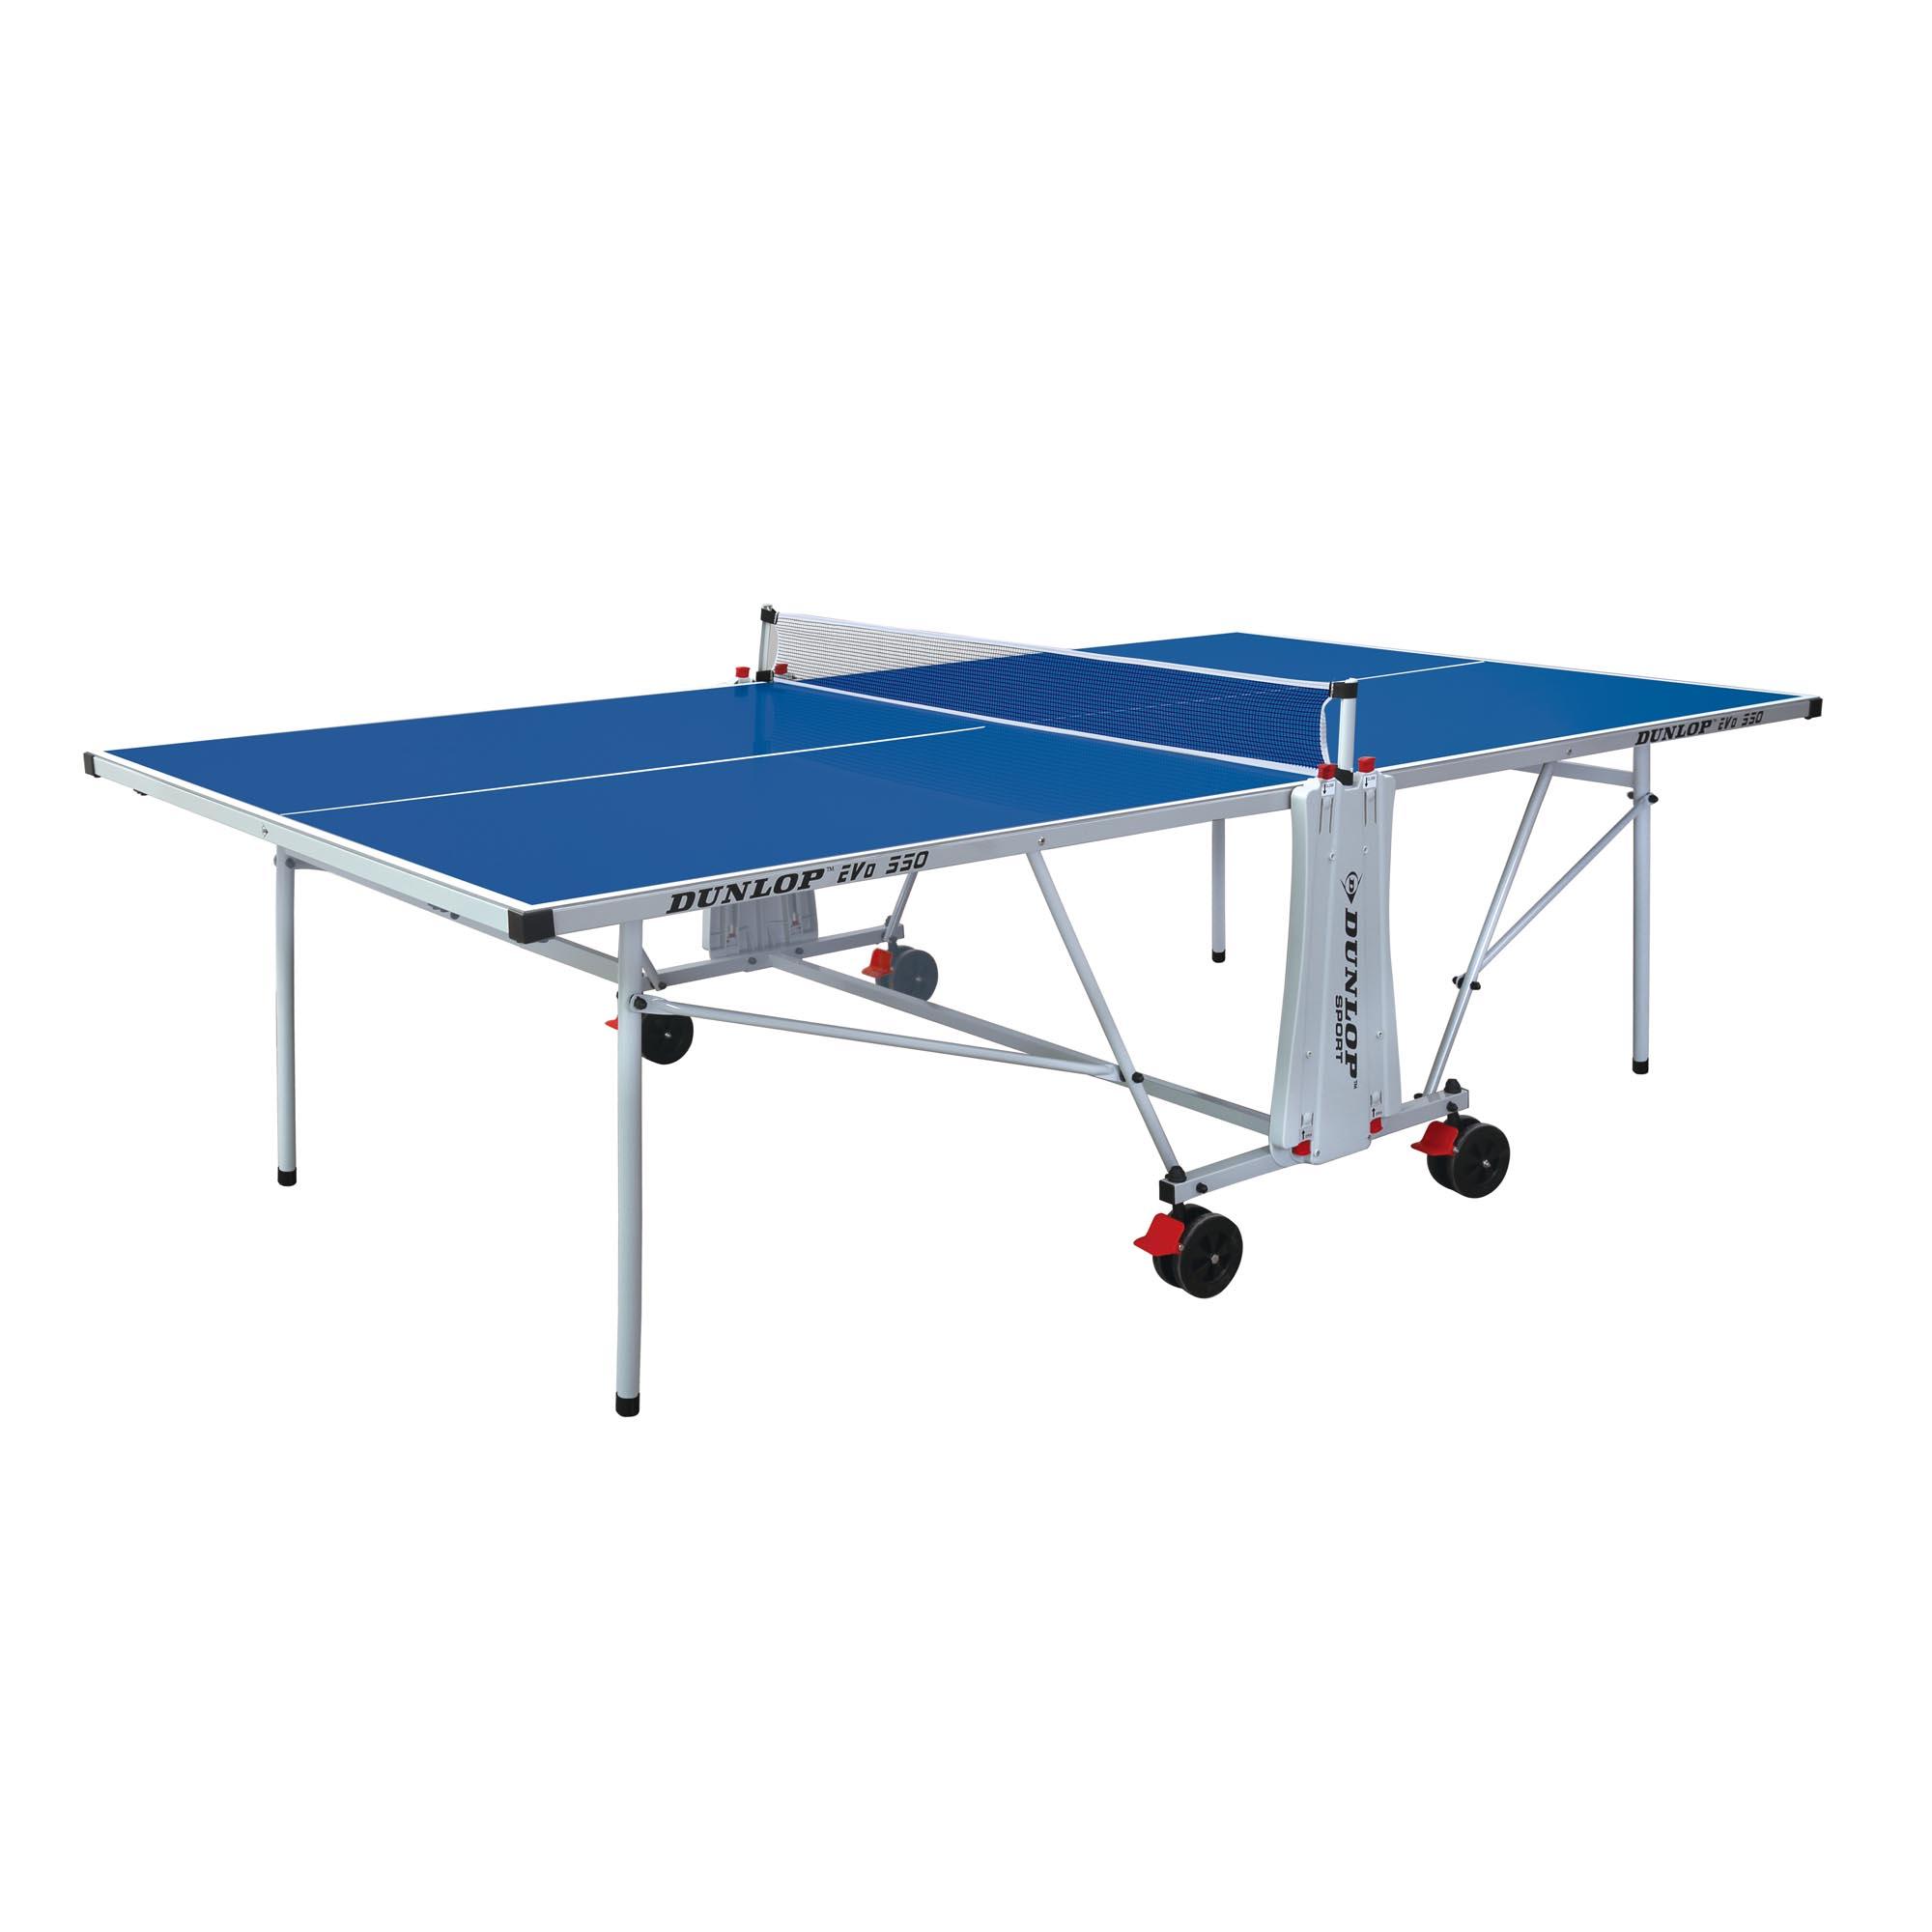 Dunlop Evo 550 Outdoor Table Tennis Table  Blue